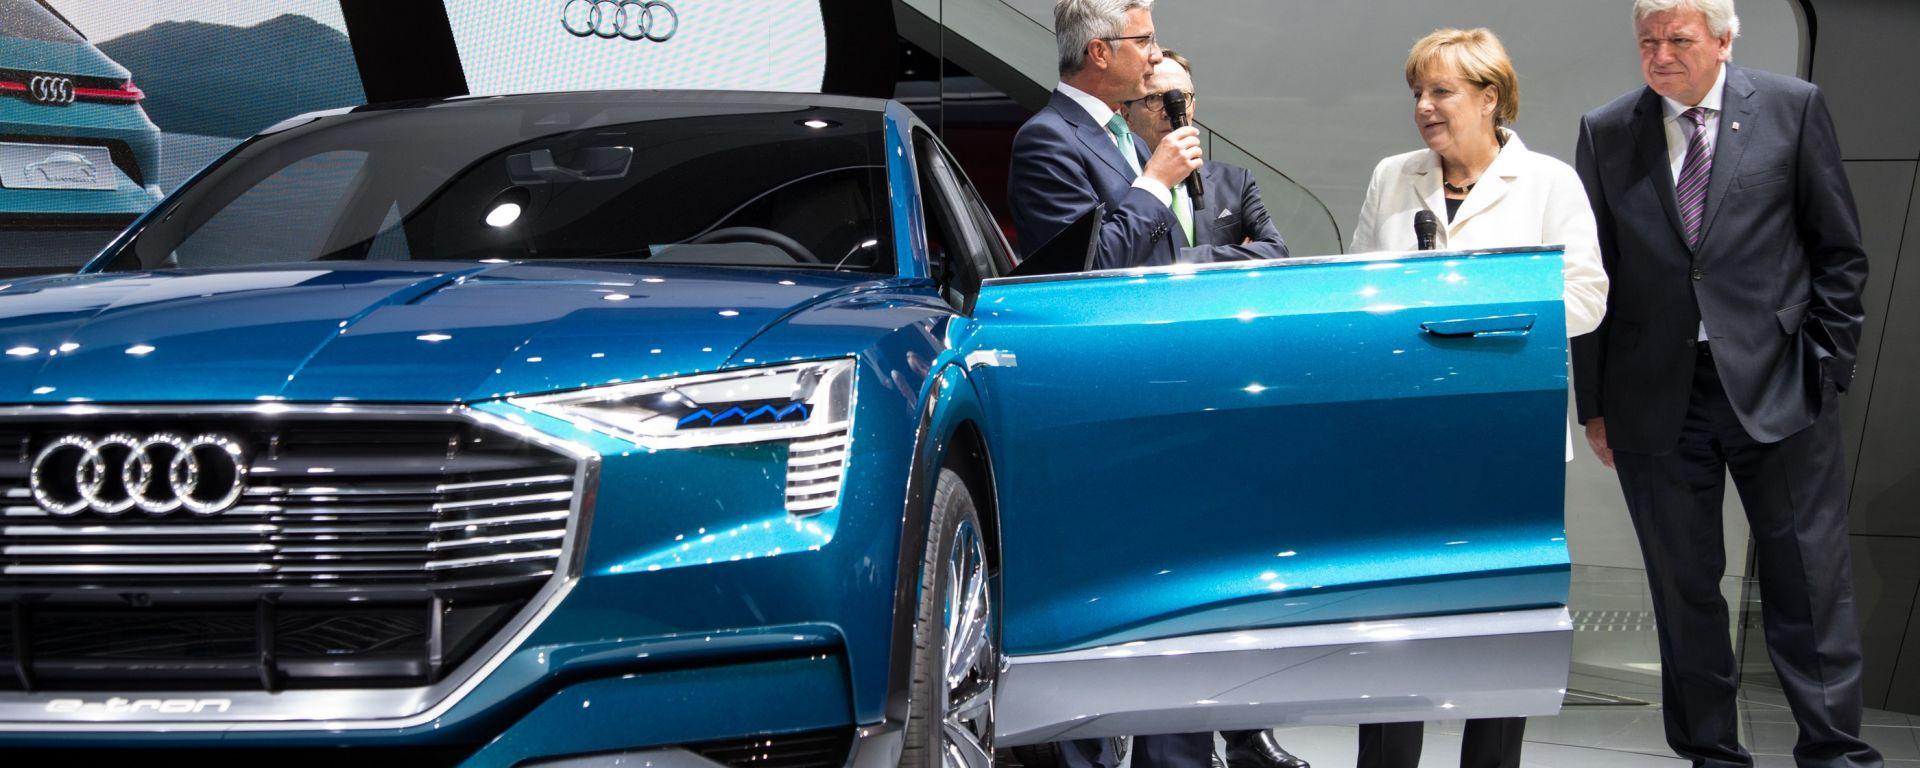 IAA Francoforte 2015: le novità Audi